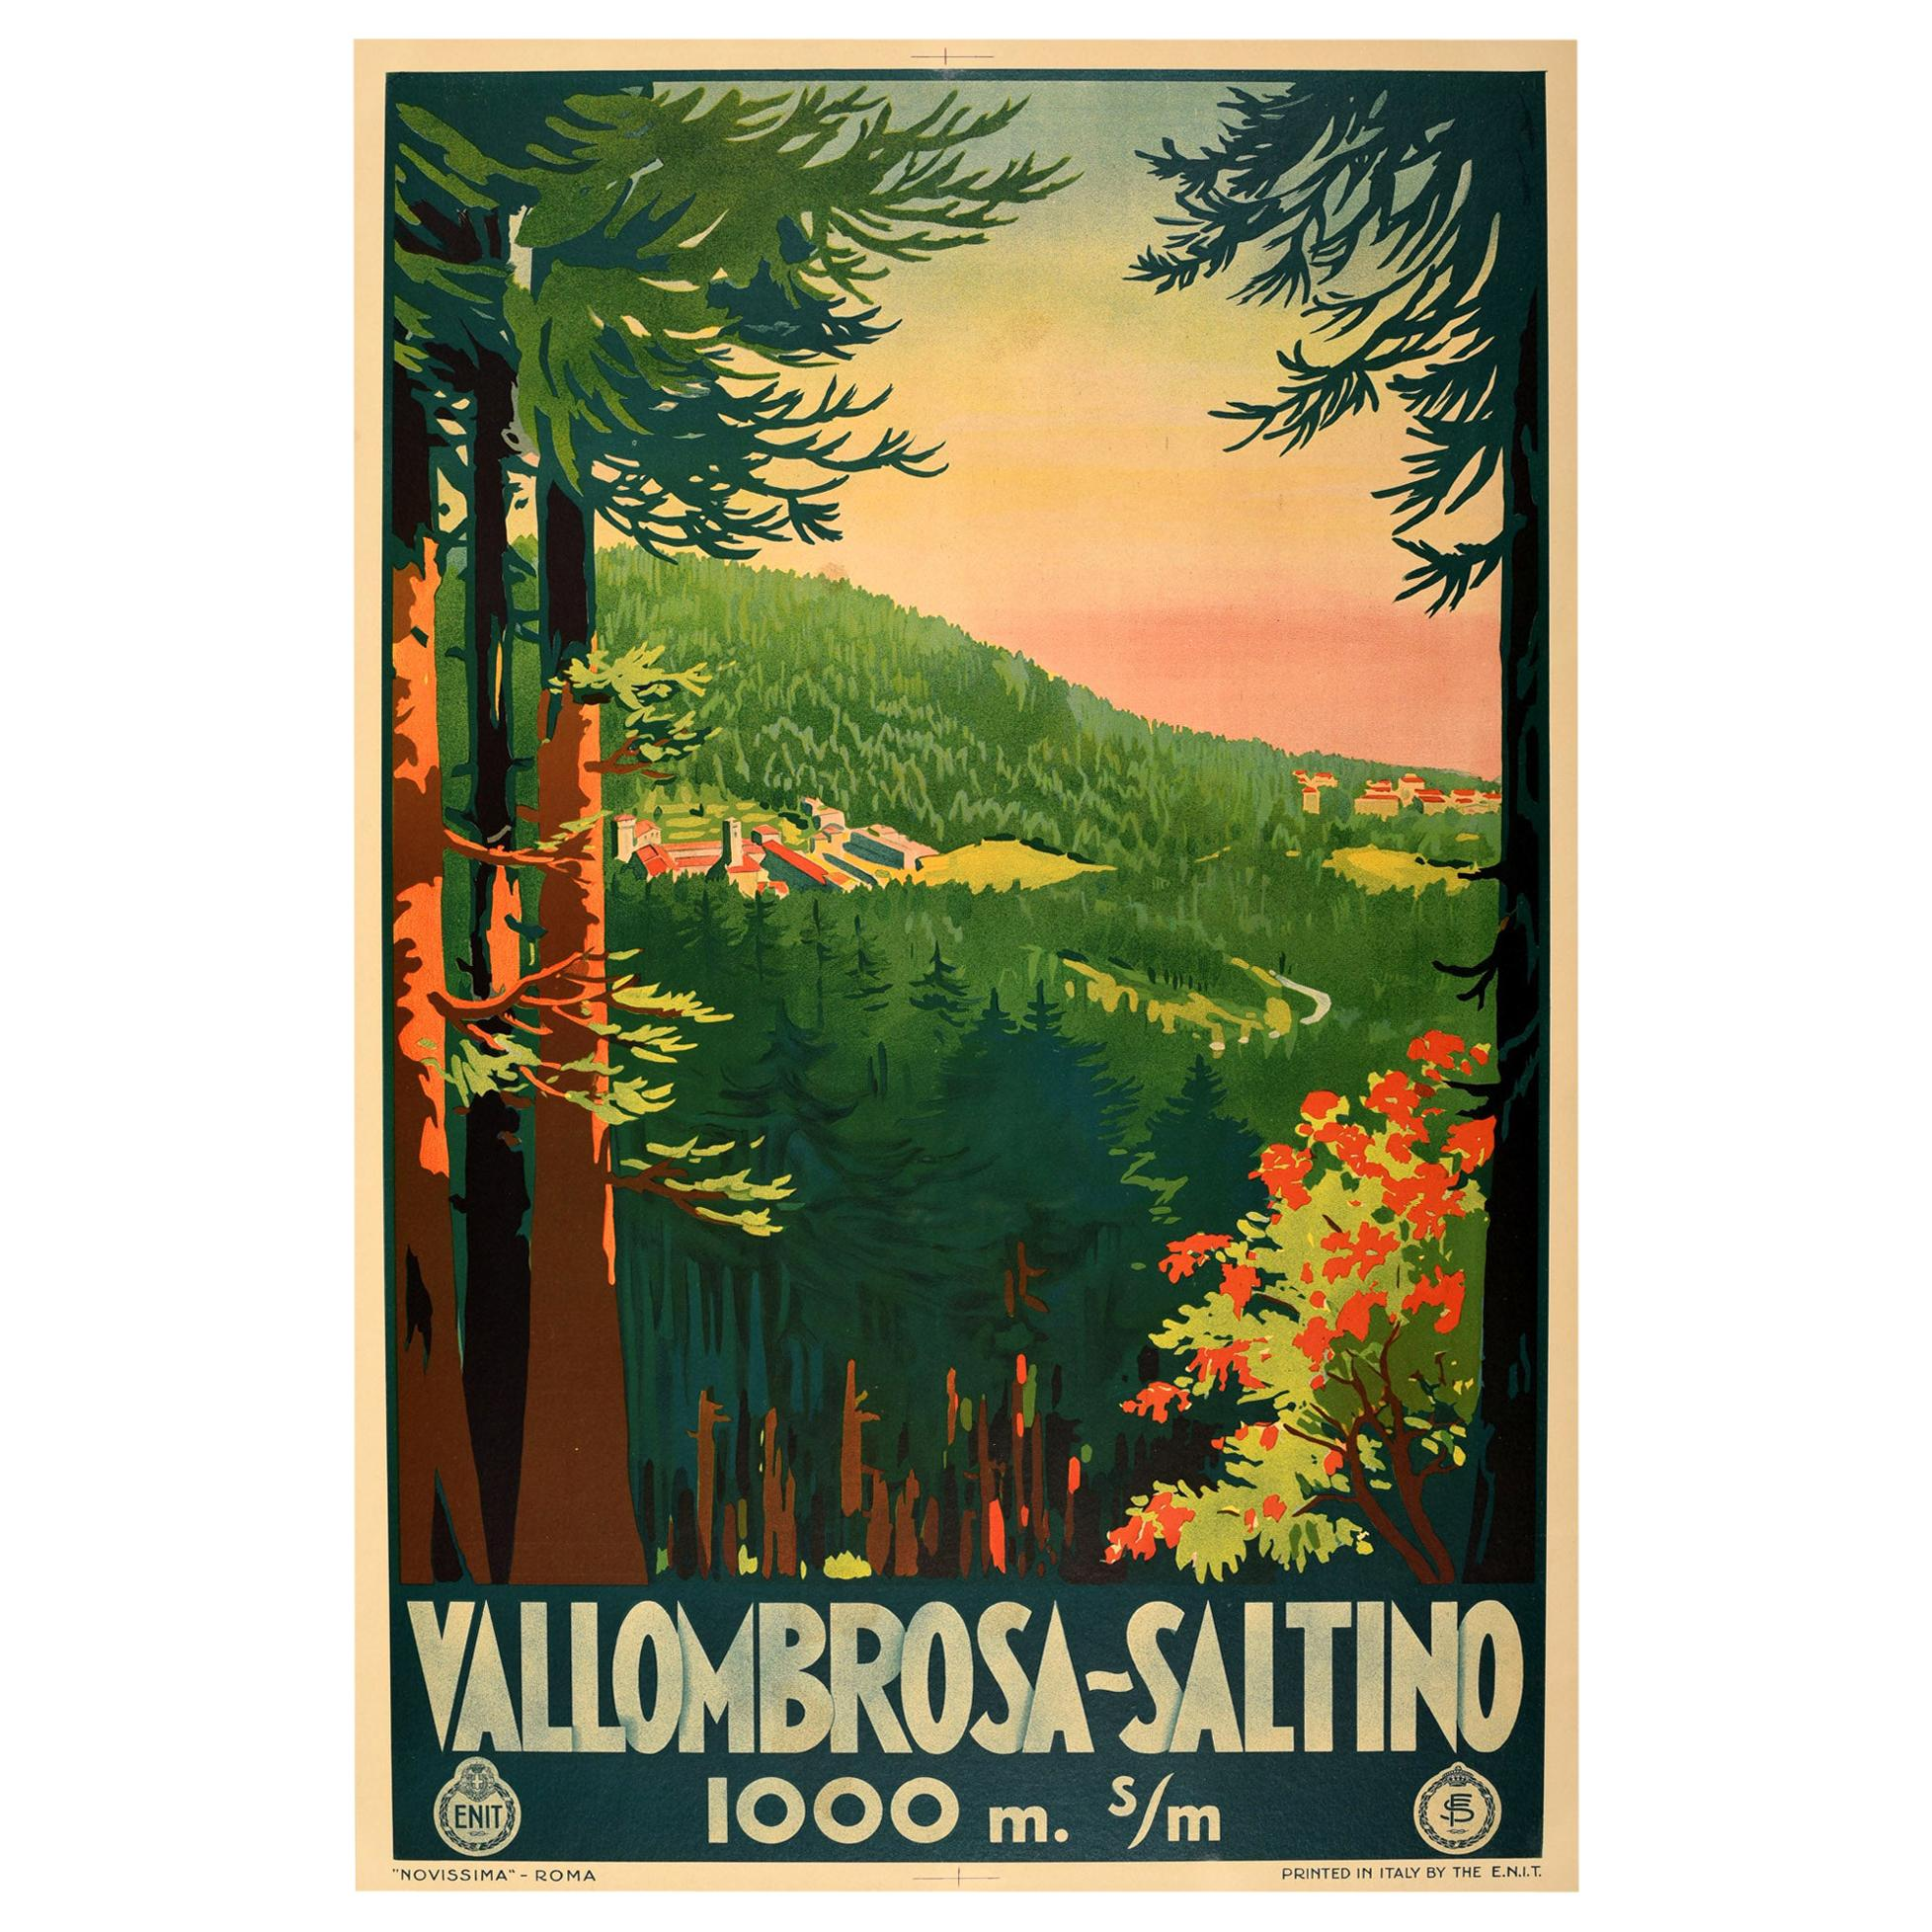 Original Vintage Poster Vallombrosa Saltino Tuscany Forest Railway Travel ENIT